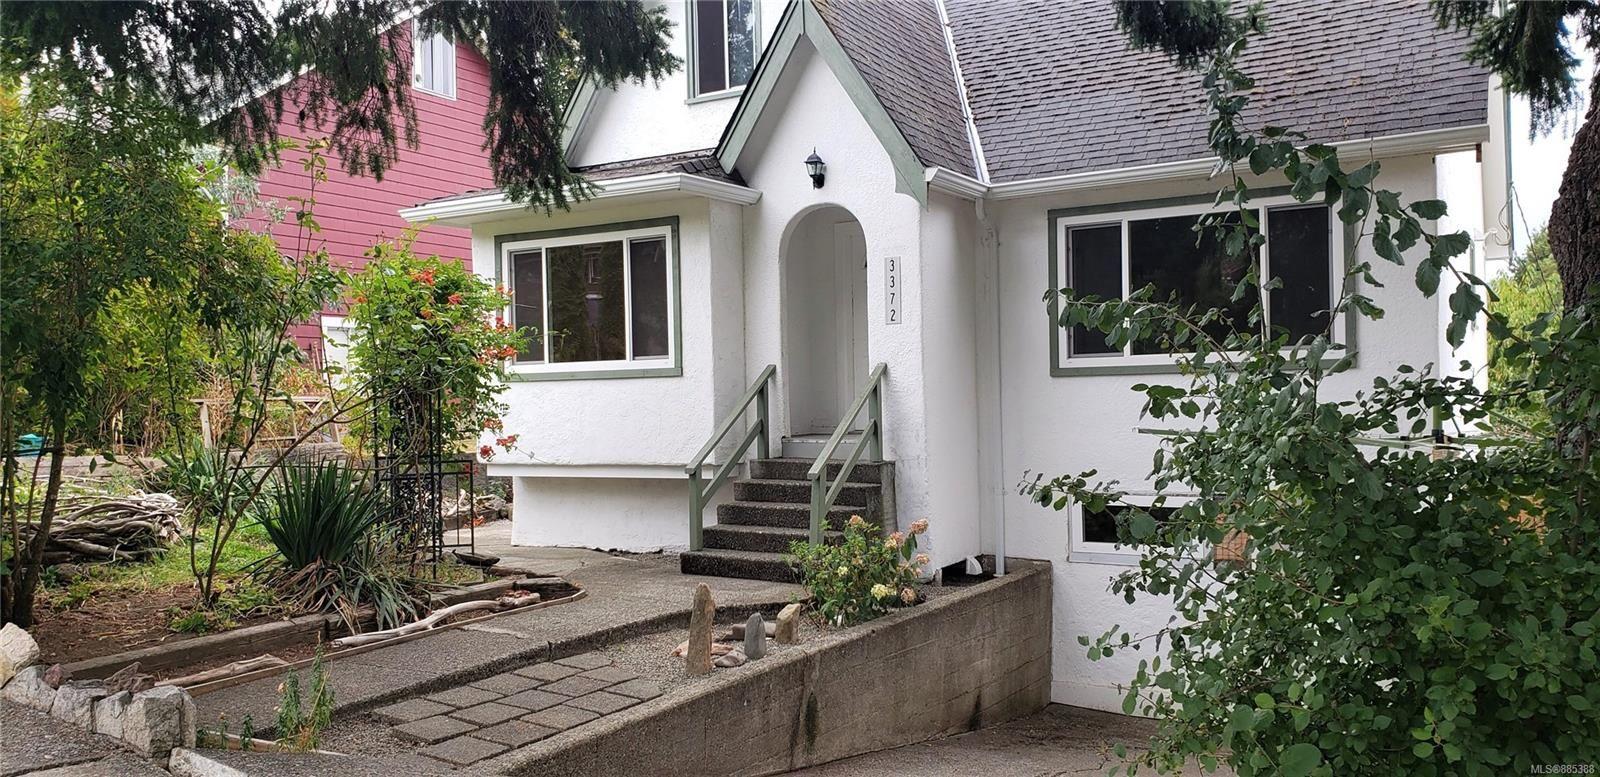 Main Photo: 3372 5th Ave in : PA Port Alberni House for sale (Port Alberni)  : MLS®# 885388